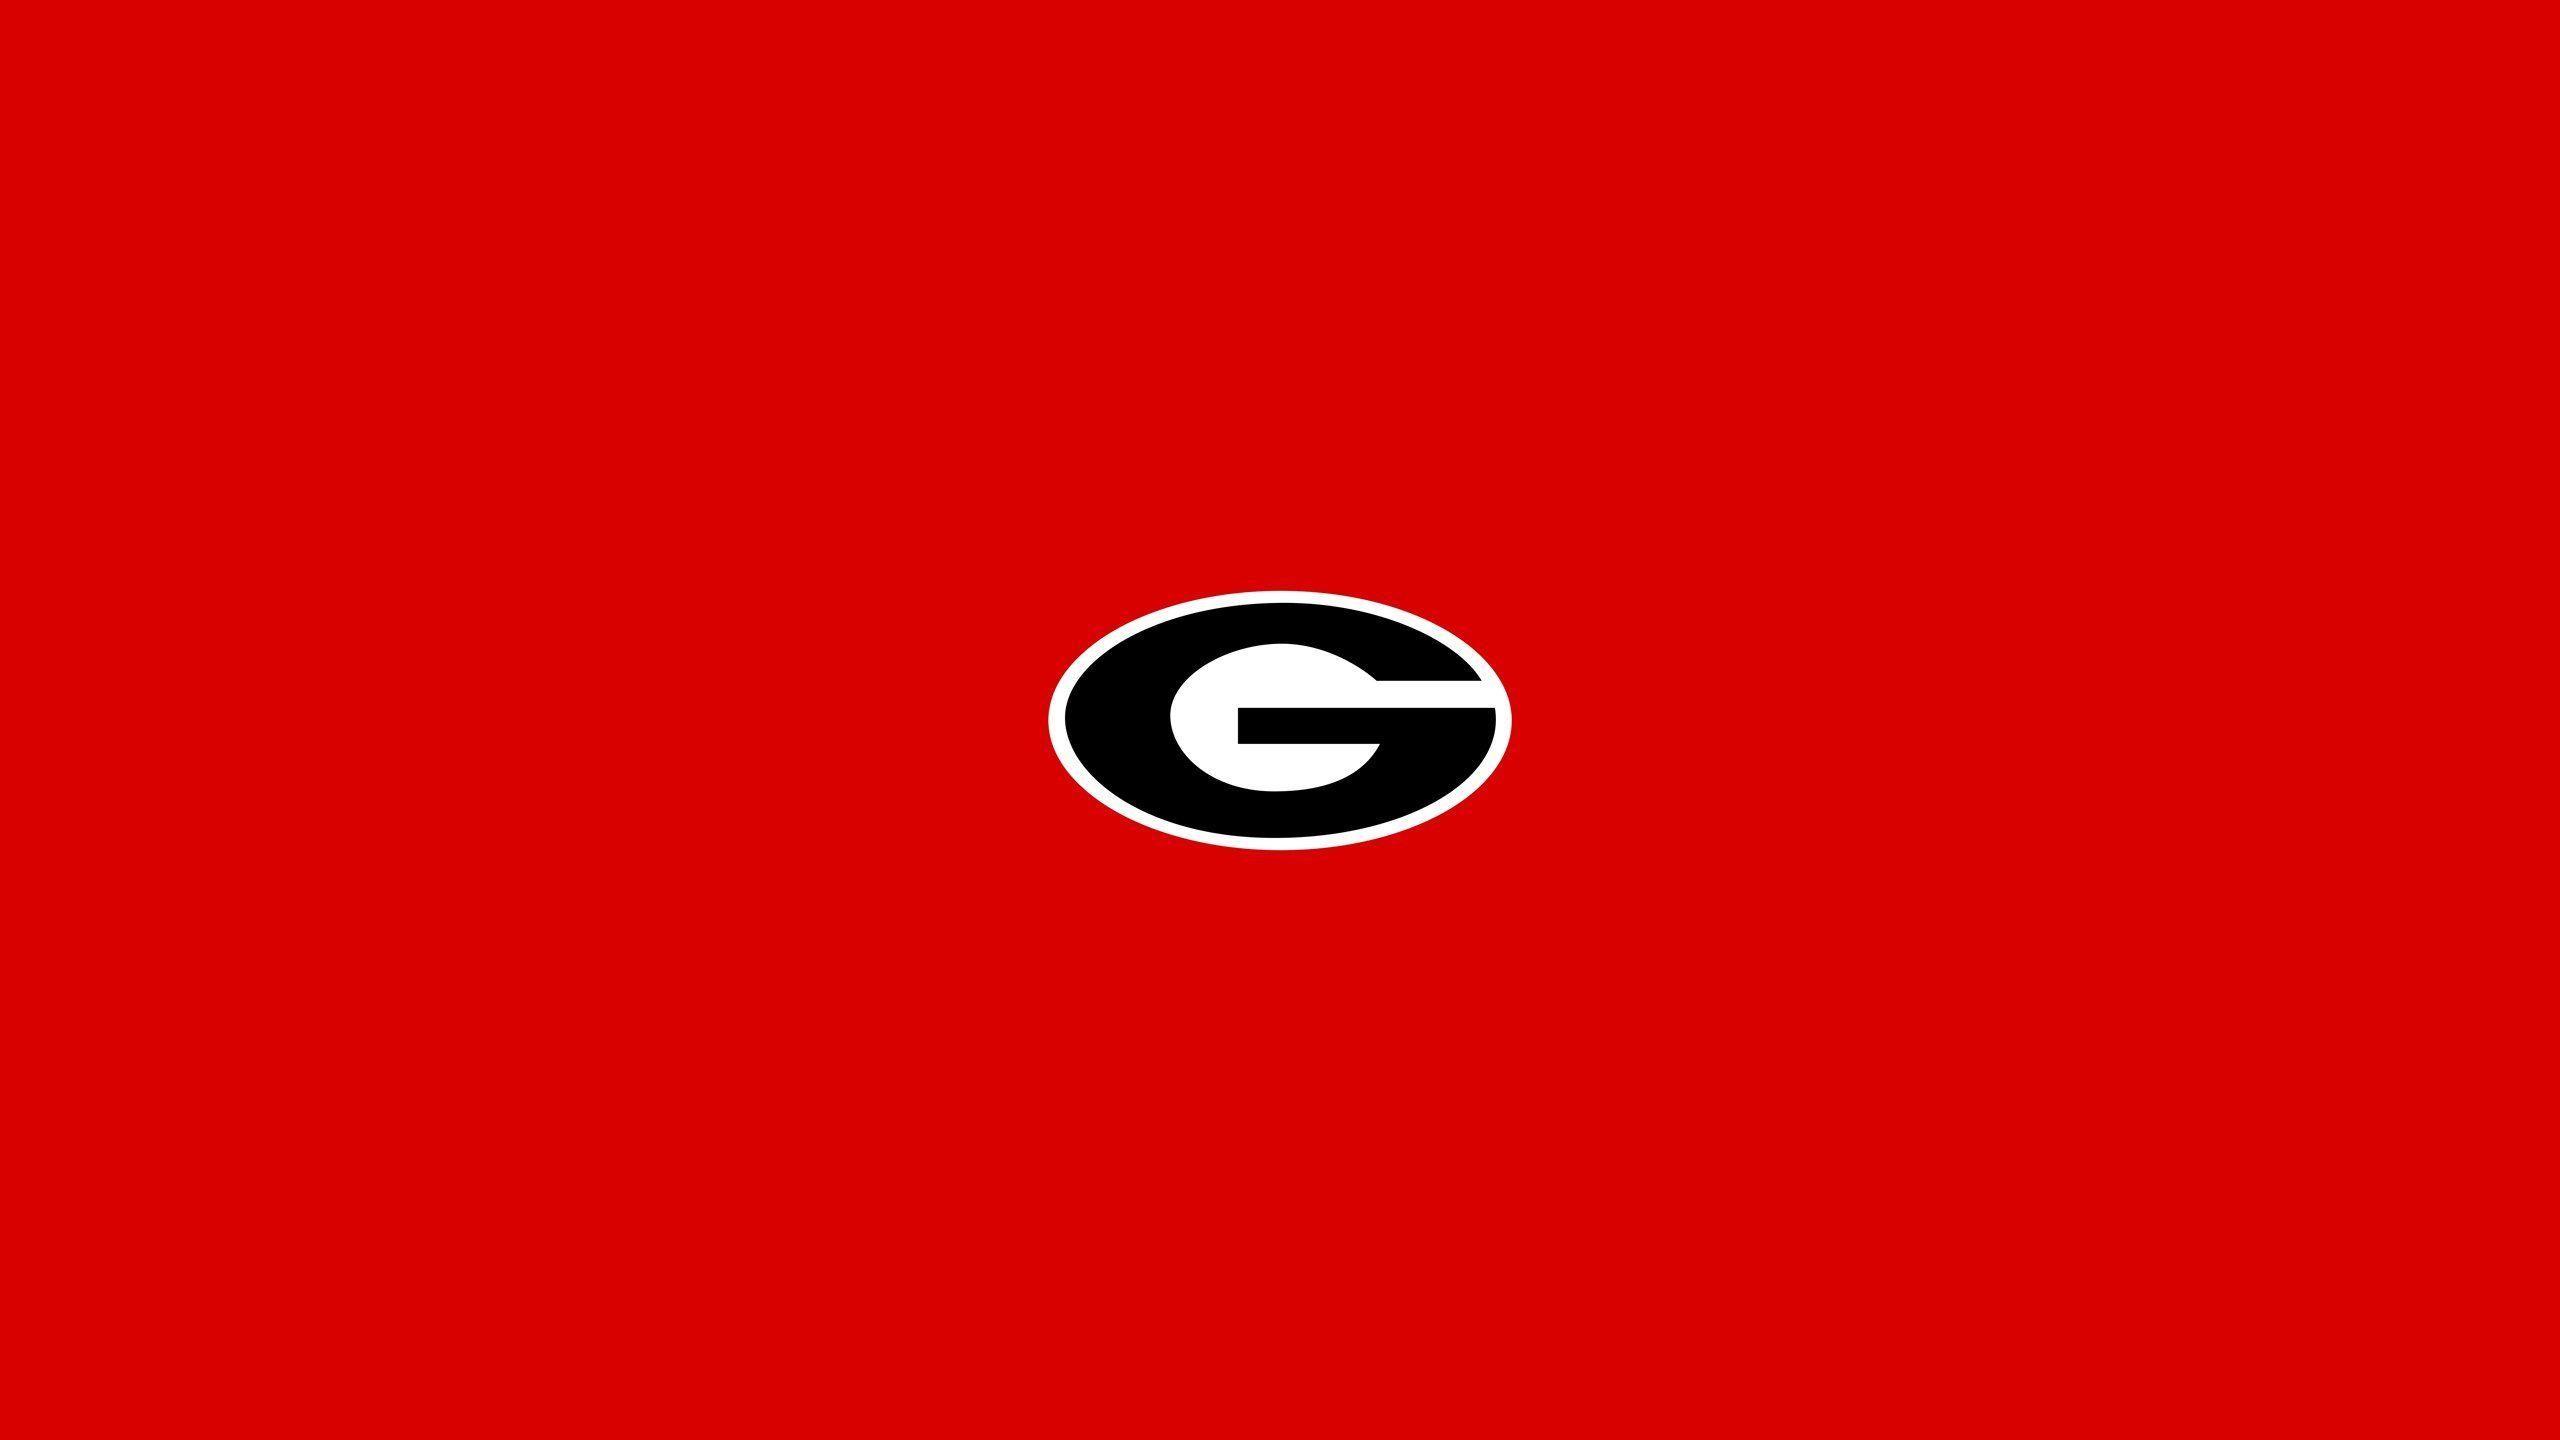 2560x1440 Georgia Bulldogs Wallpaper